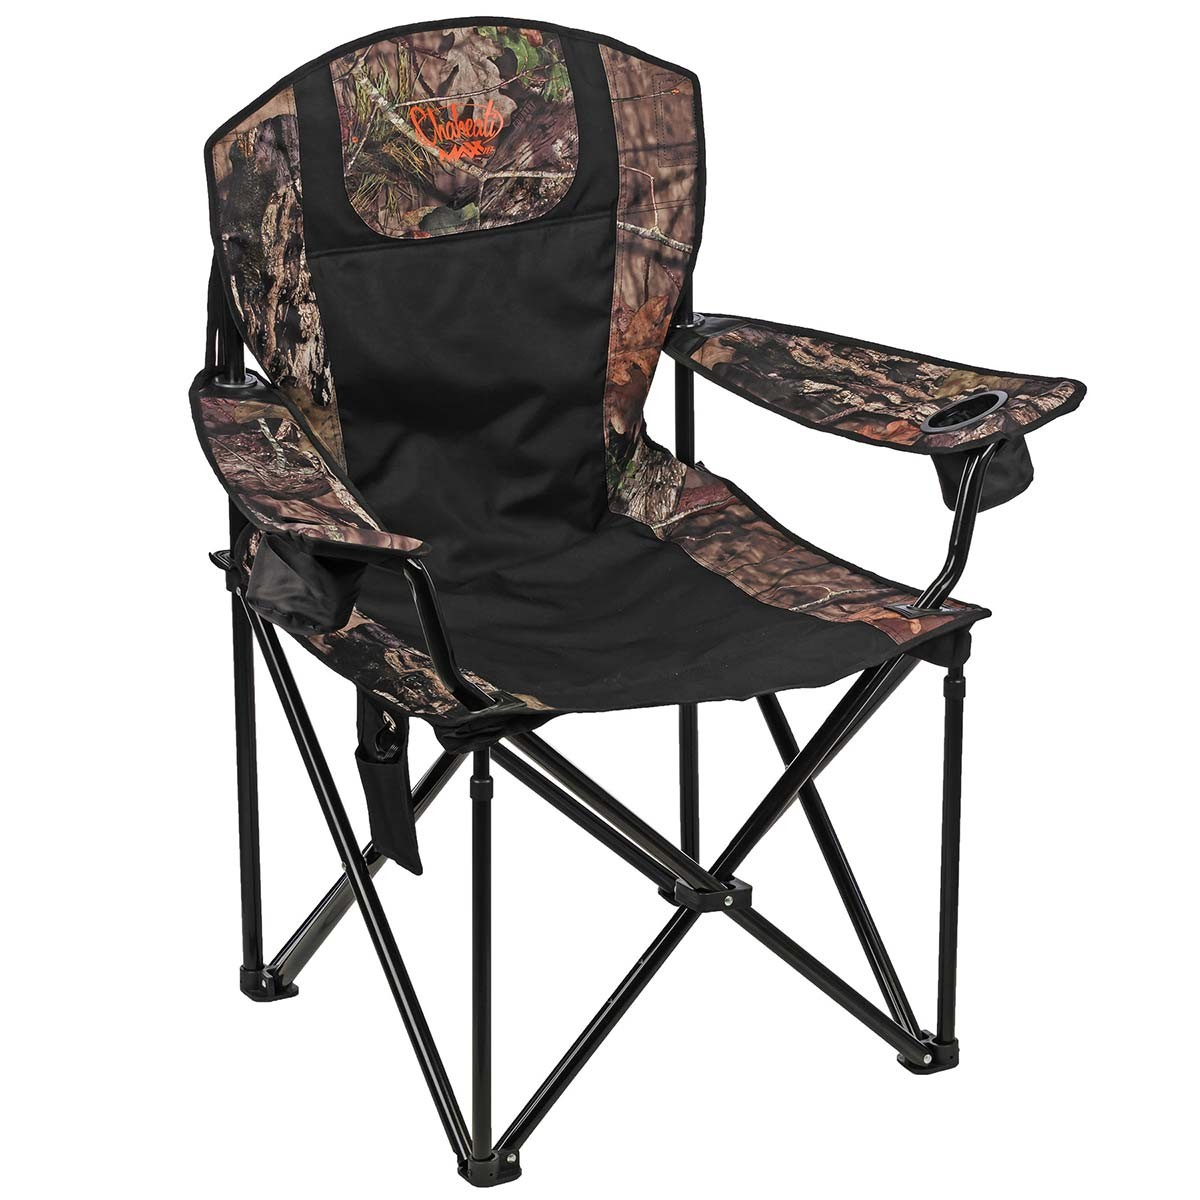 Chaheati Mossy Oak Maxx Heated Folding Chair A00 052